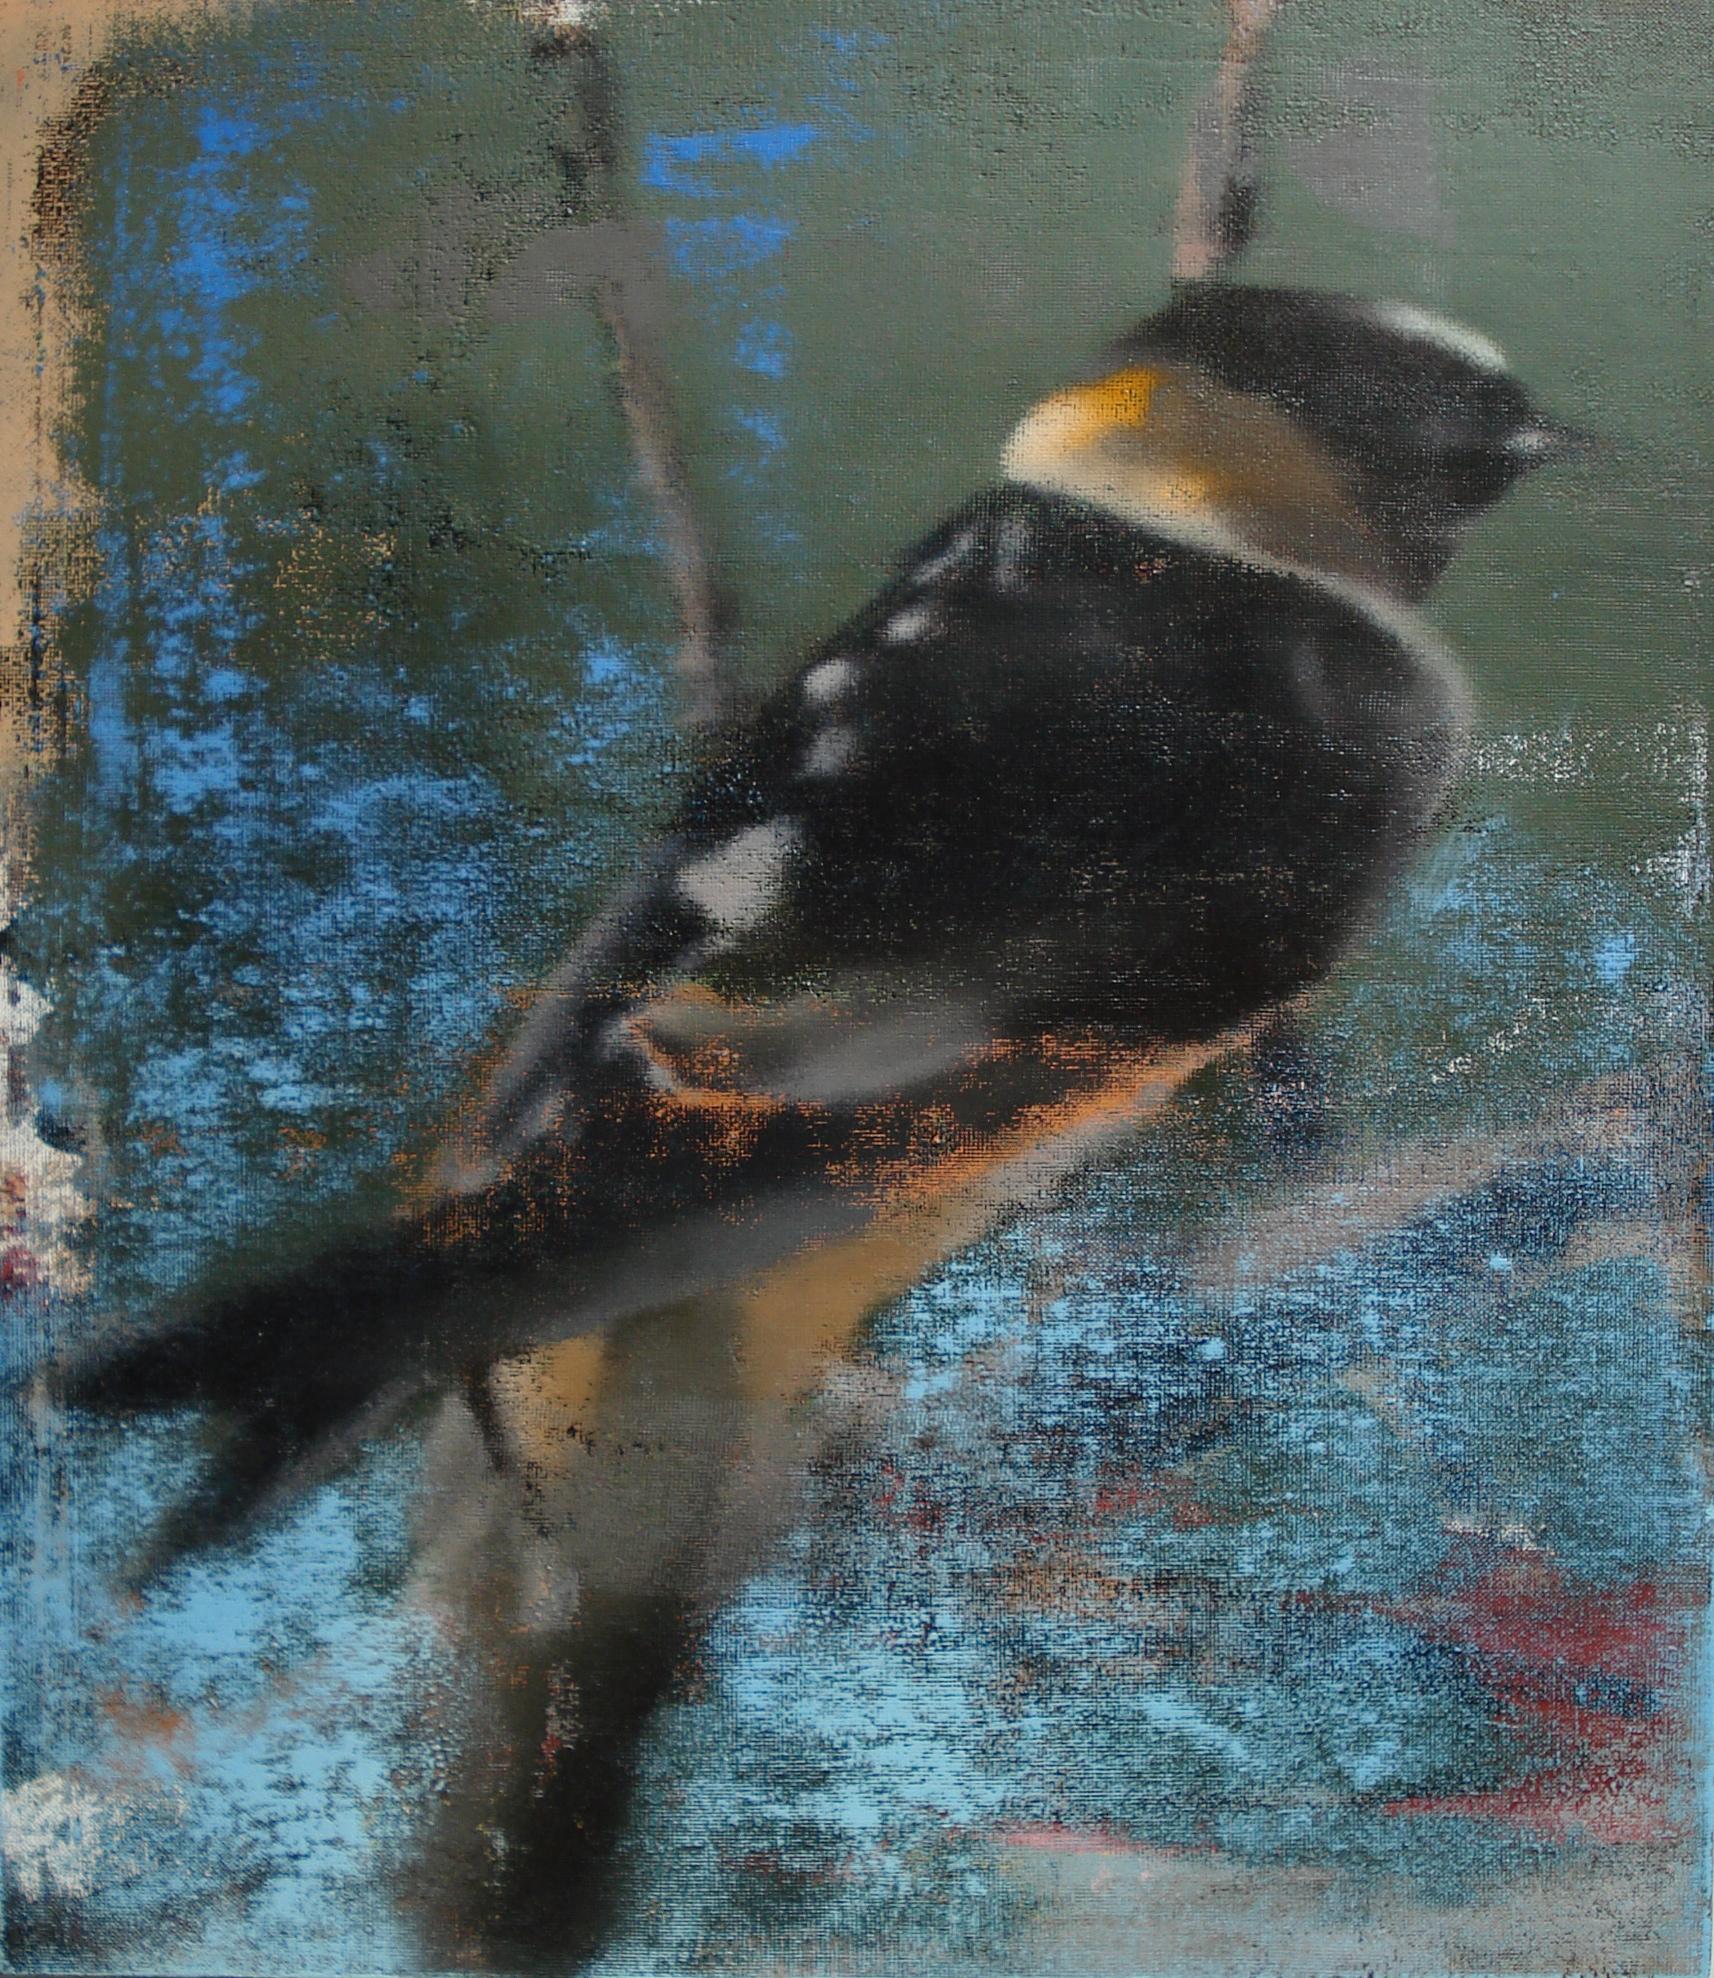 "Cliff Swallow, Oil on Linen on Panel, 2011, 30"" x 26"""